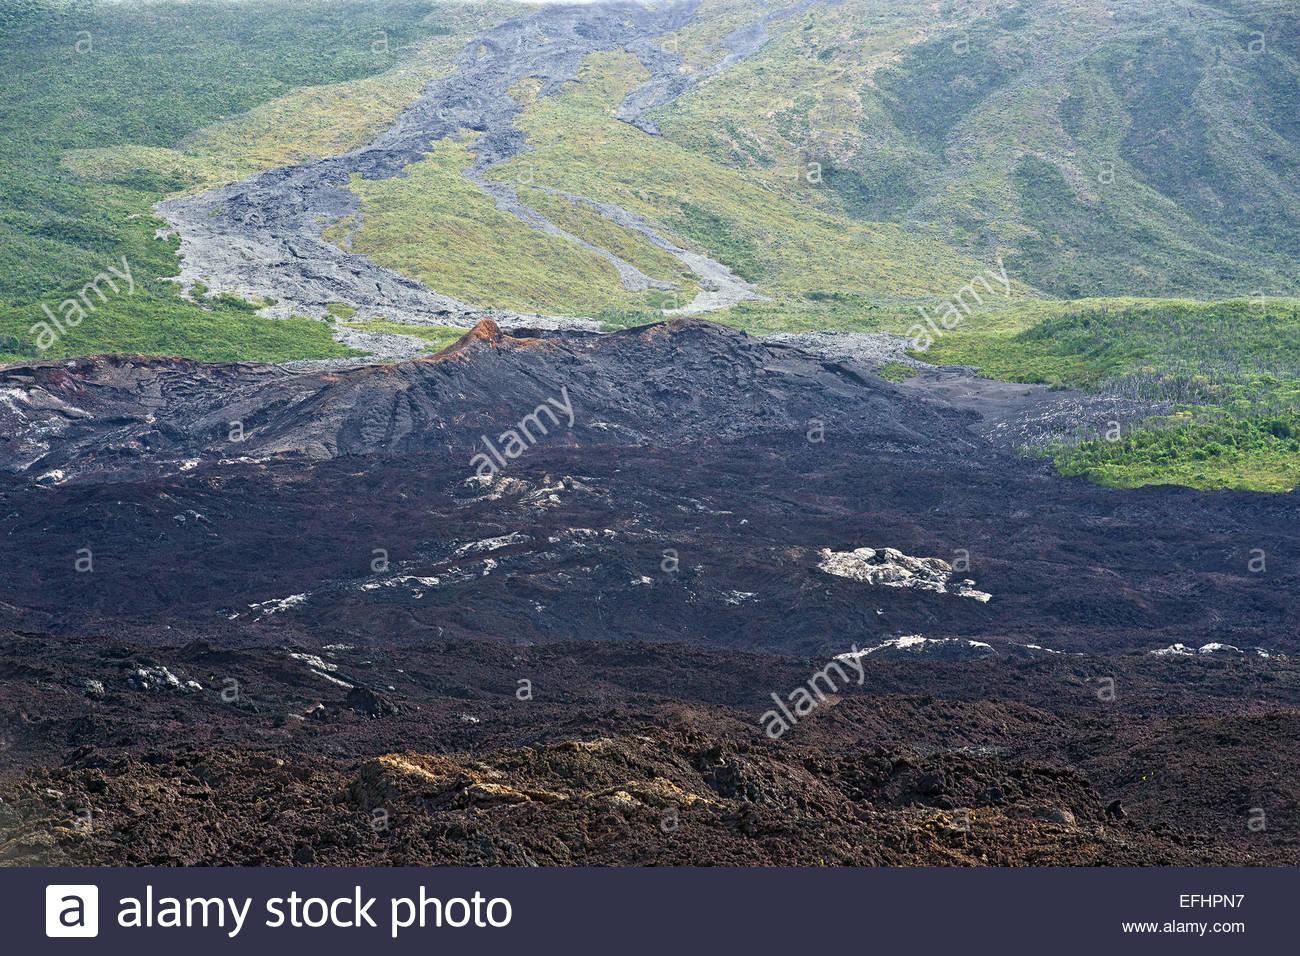 Reunion island : lava flow - Stock Image